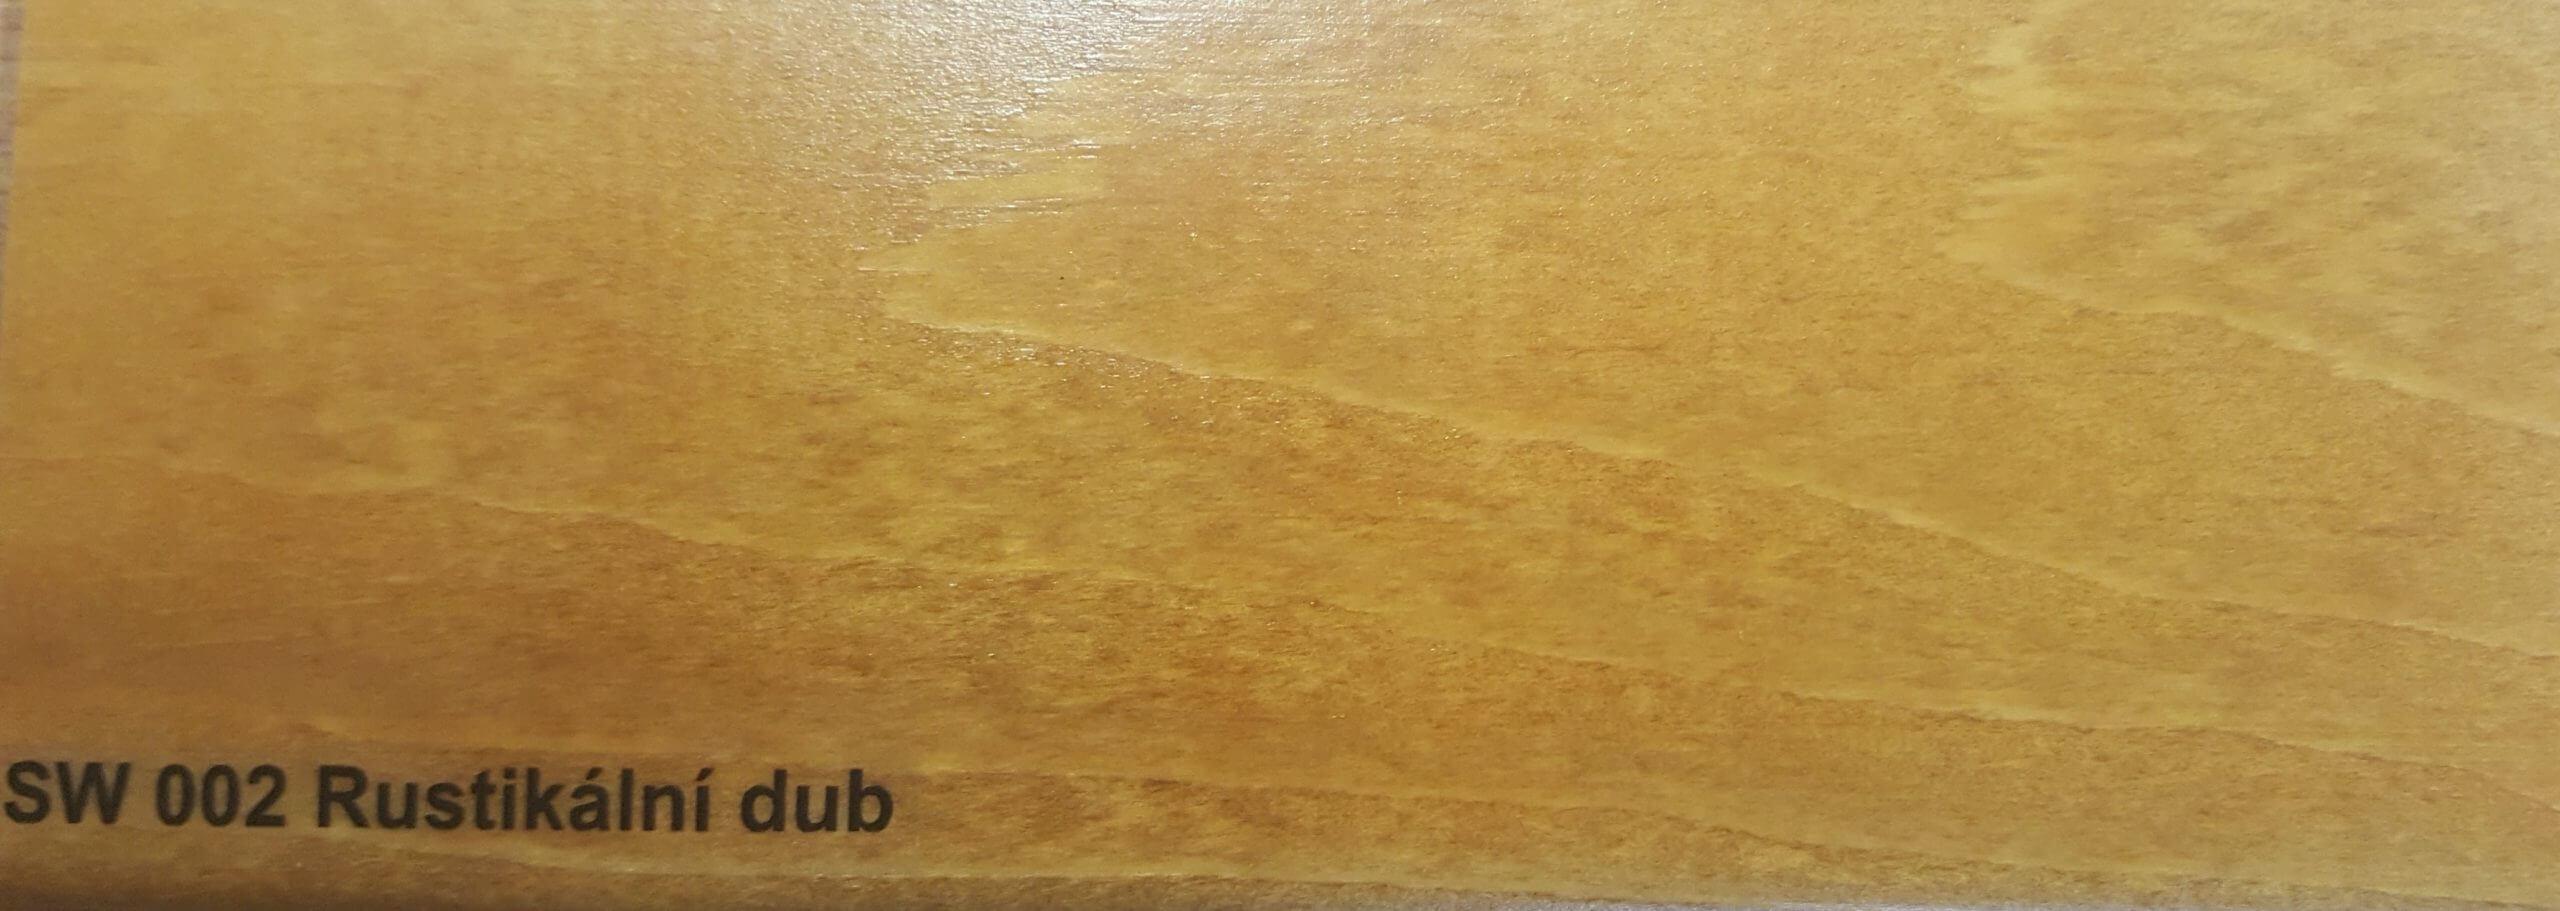 SW 002 Rustikální dub